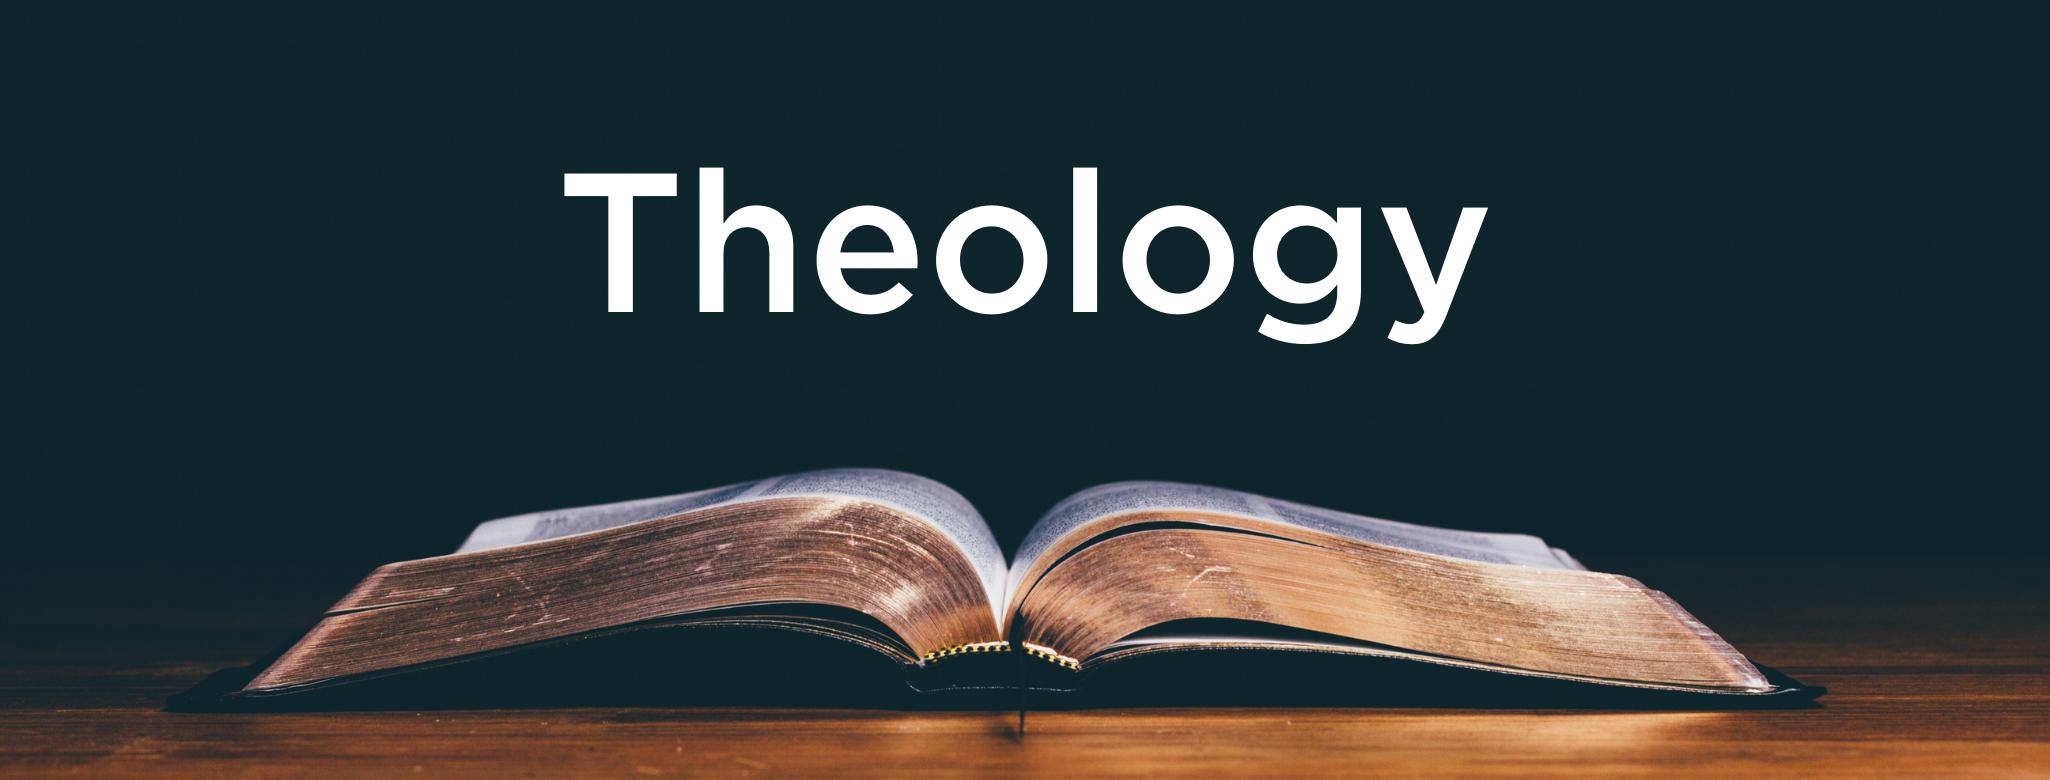 Theology Banner (1)